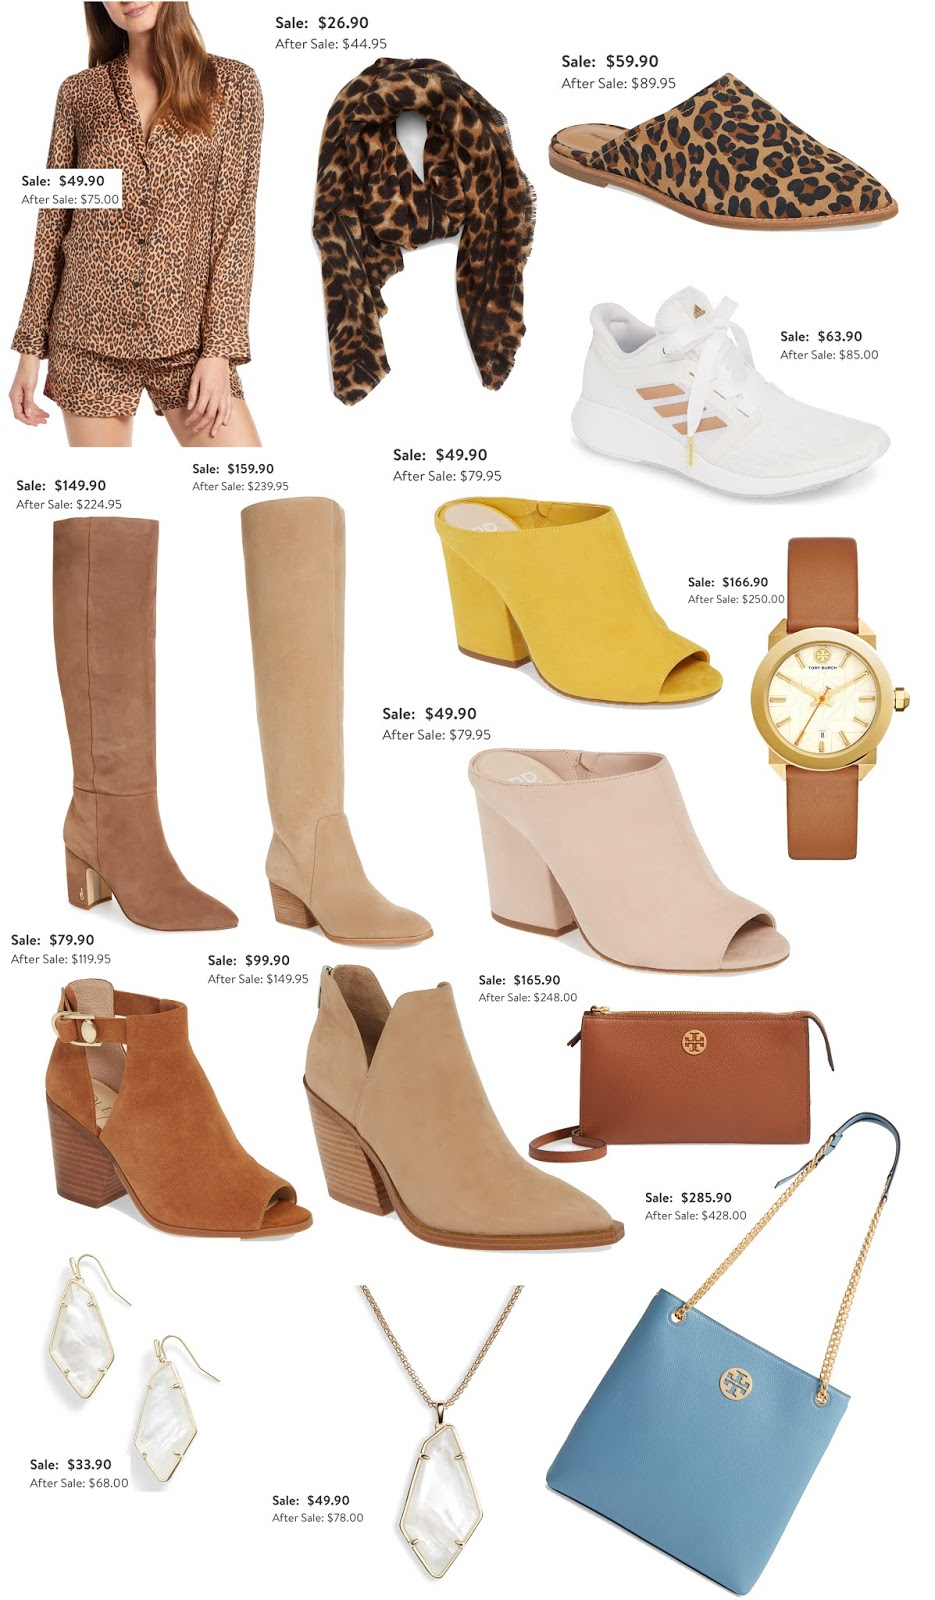 Nordstrom Anniversary Sale 2019: Sneak Peaks + Some Items on My Wish List - Something Delightful Blog